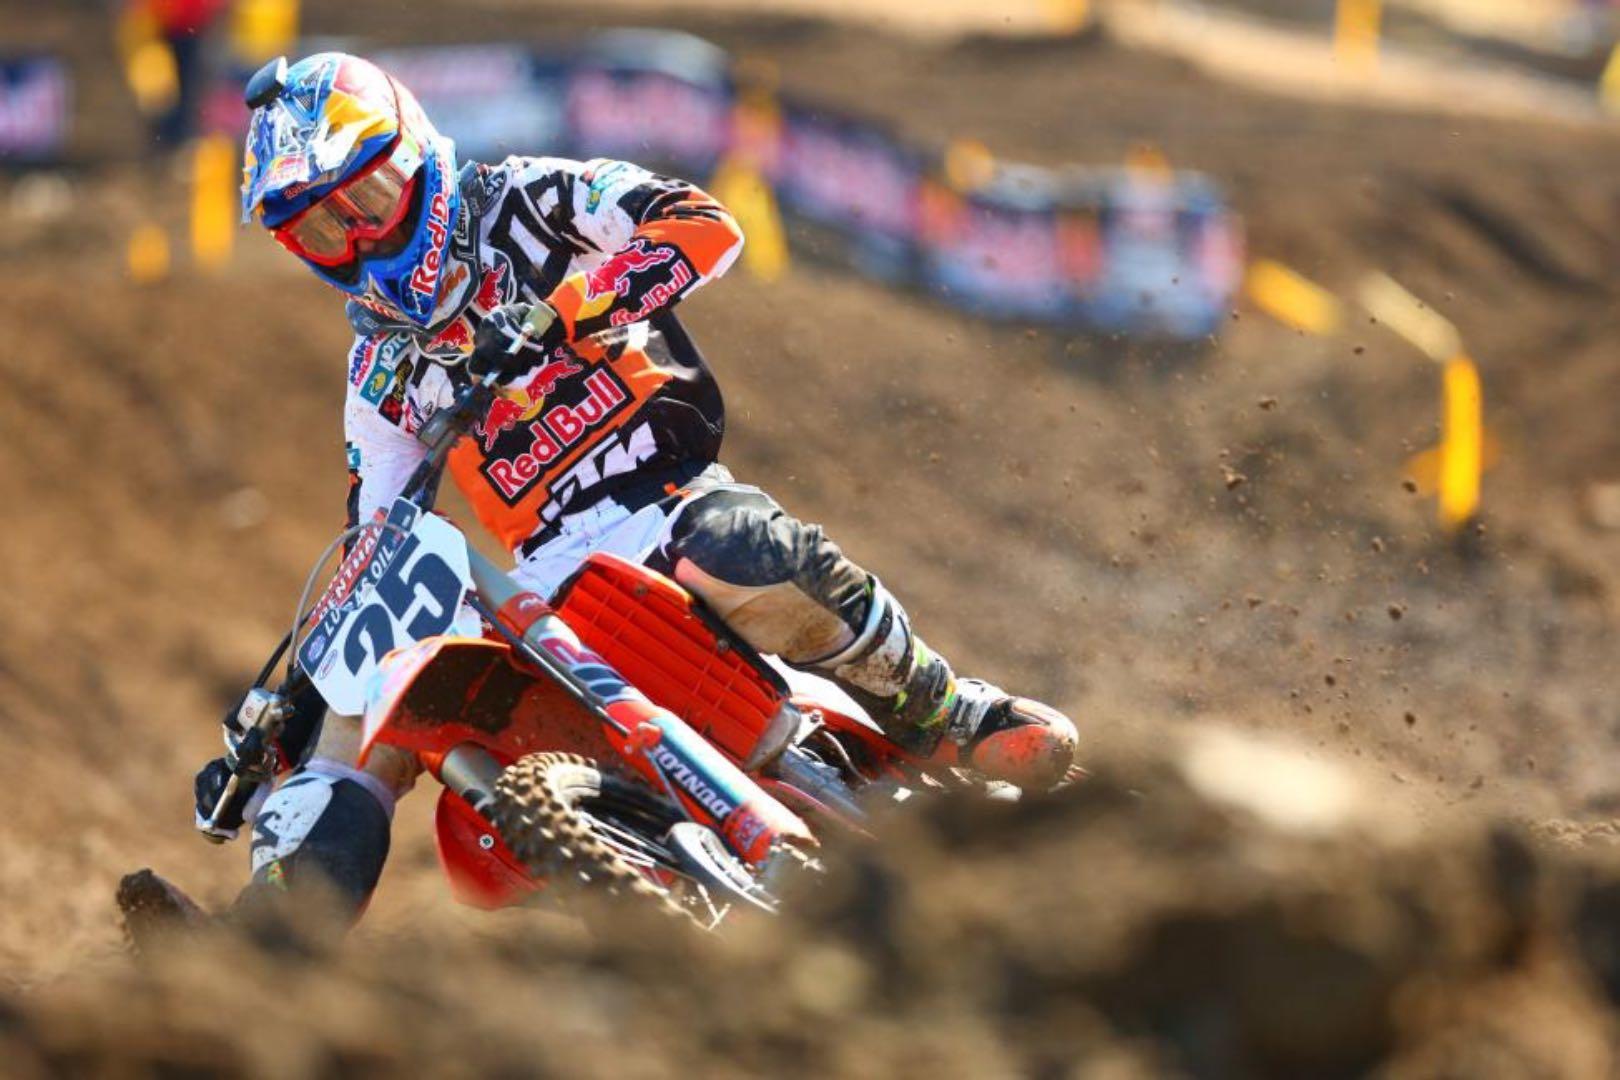 2017 Budds Creek Motocross: KTMs Marvin Musqin